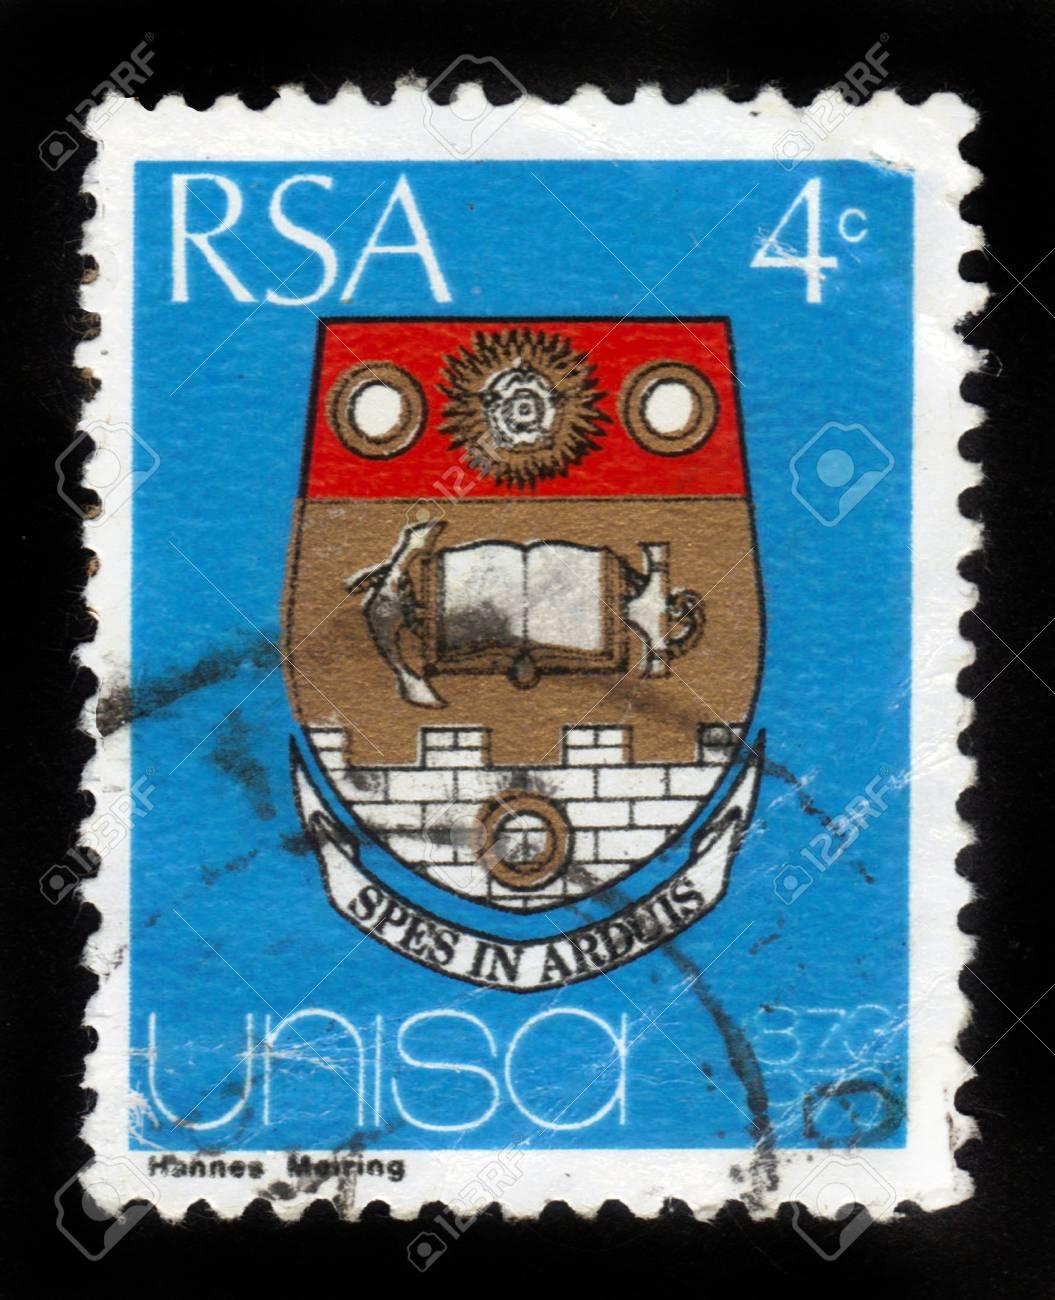 REPUBLIC OF SOUTH AFRICA - CIRCA 1973: A stamp printed in Republic of South Africa shows coat of arms of the university of the South Africa (Unisa), dedicated to the centenary, circa 1973 Stock Photo - 15004713